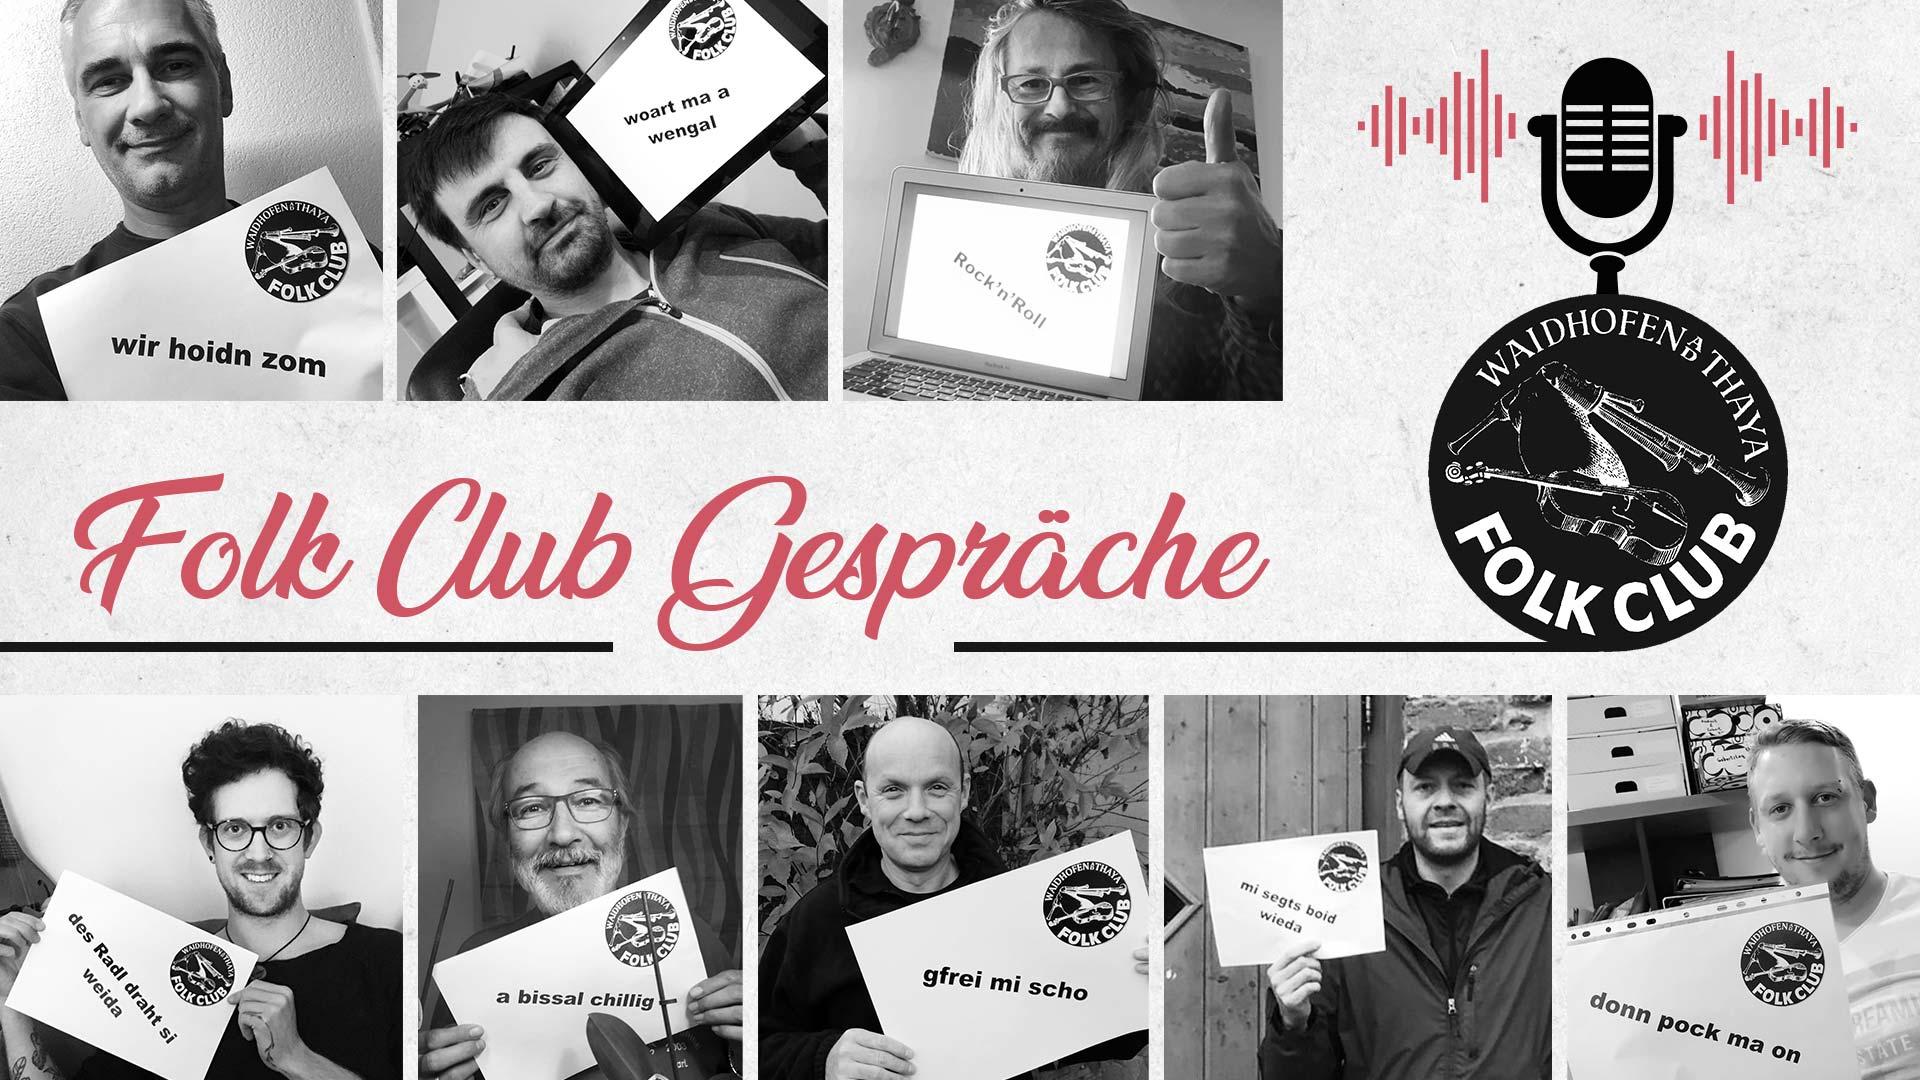 FOLK CLUB GESPRÄCHE